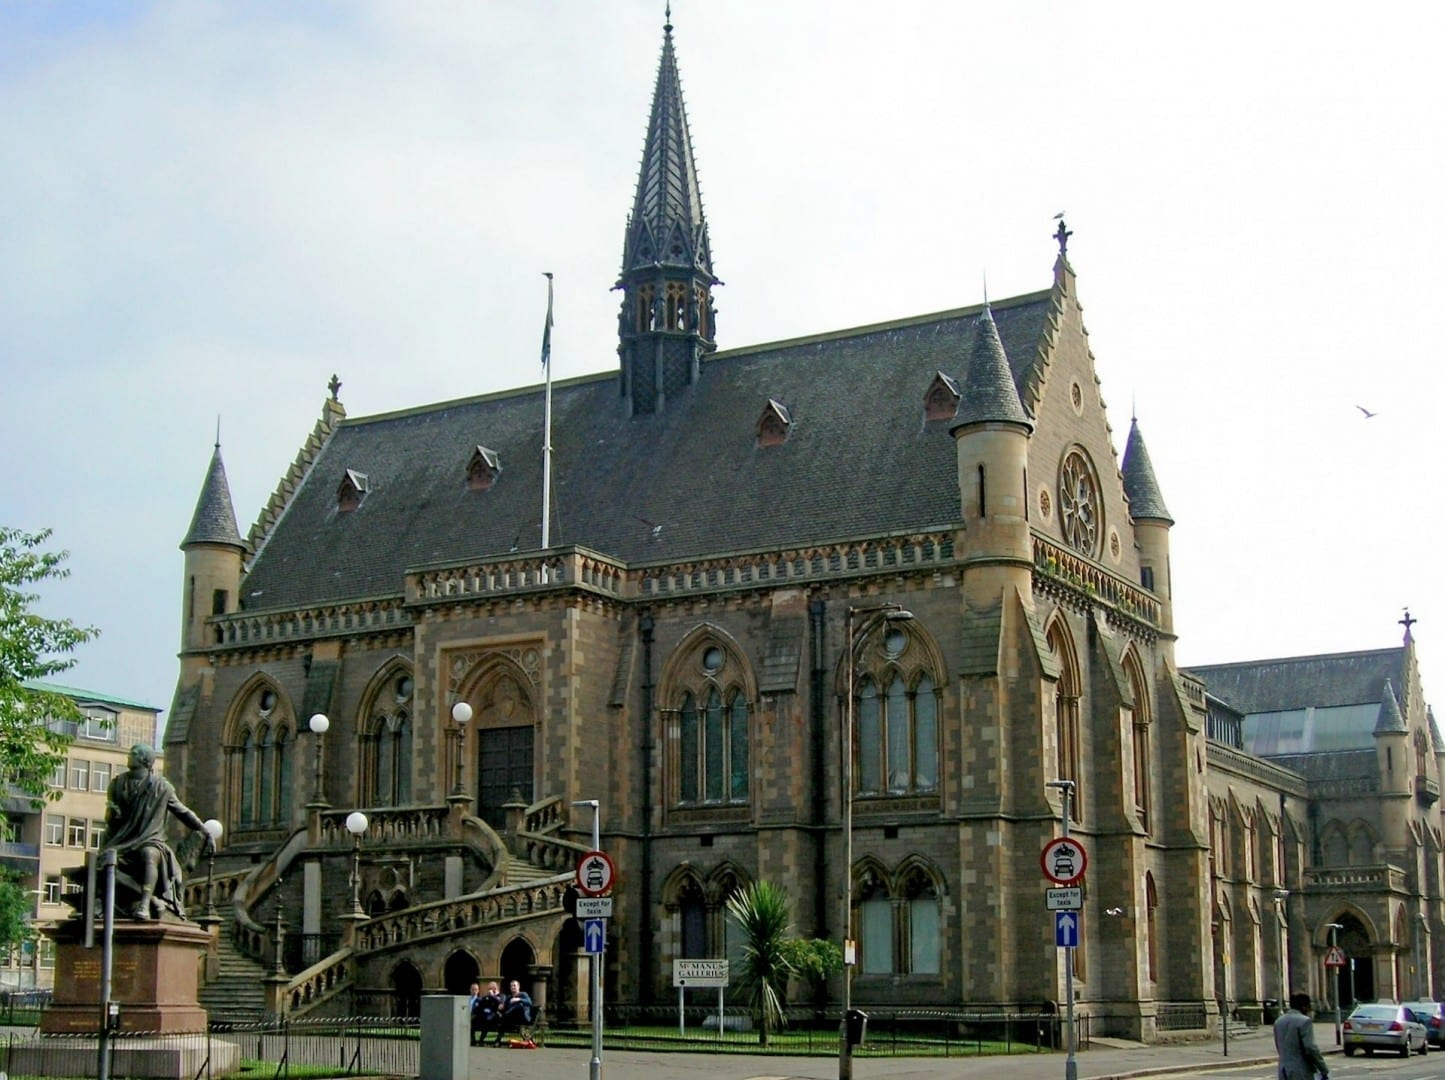 Galerías McManus Dundee Reino Unido